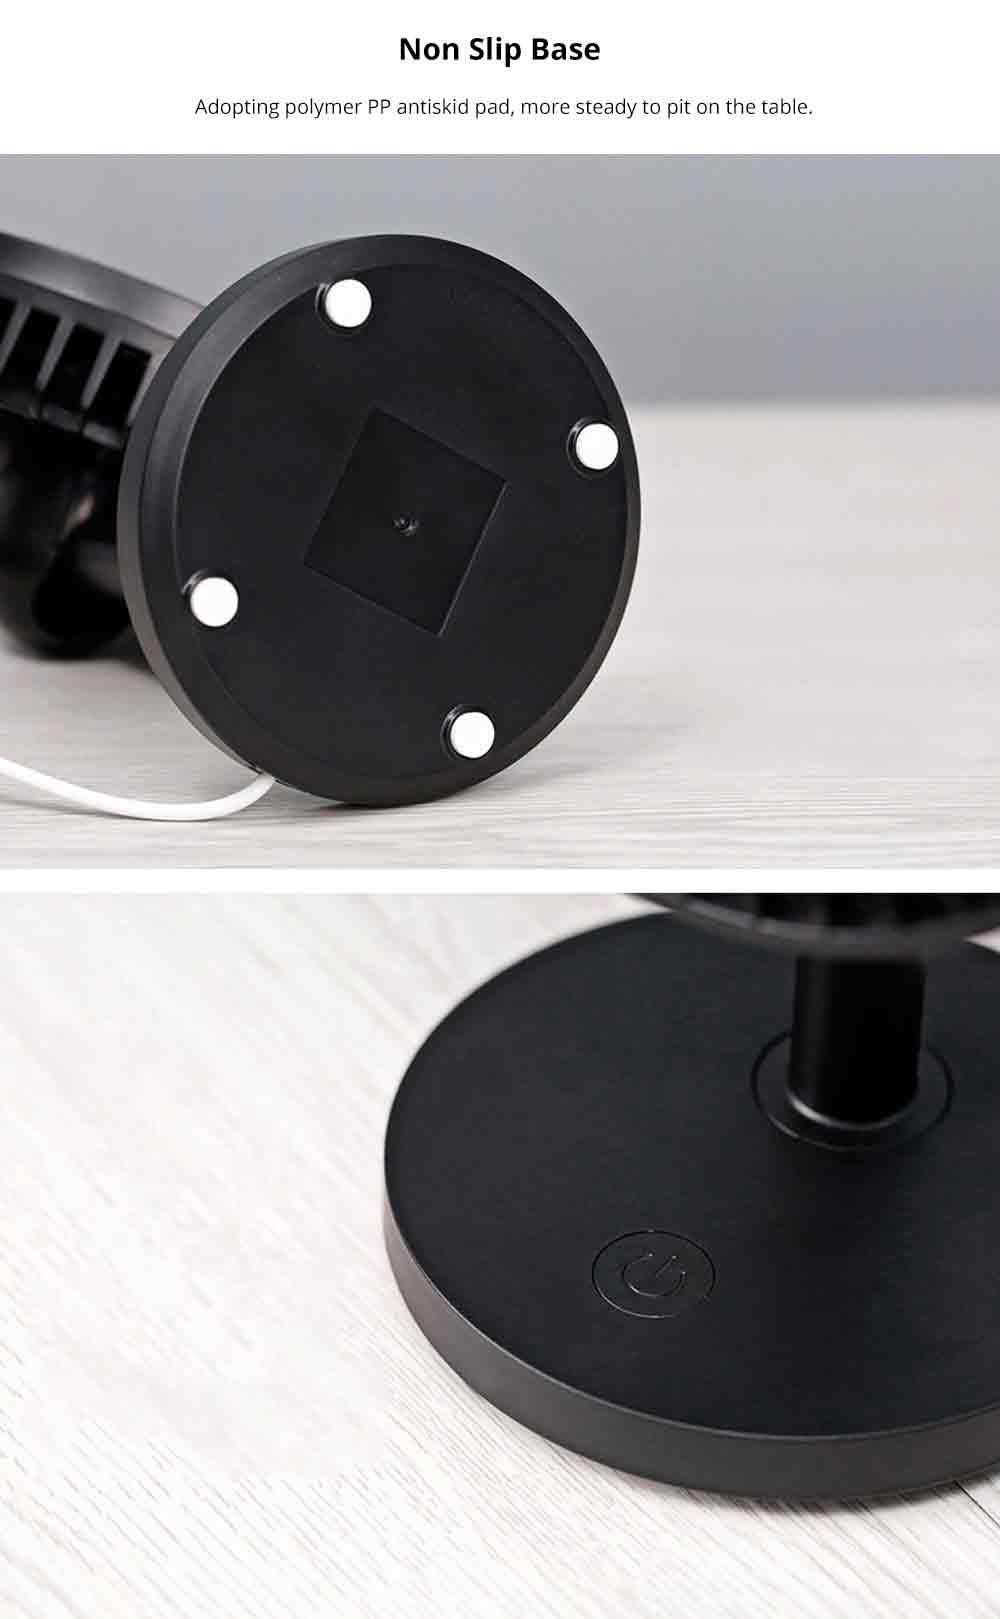 USB Desktop Mini Fan - USB Charge Mini Fan Cooling Air Desktop Hand Hold Portable Fan 3 Levels Adjustable 12